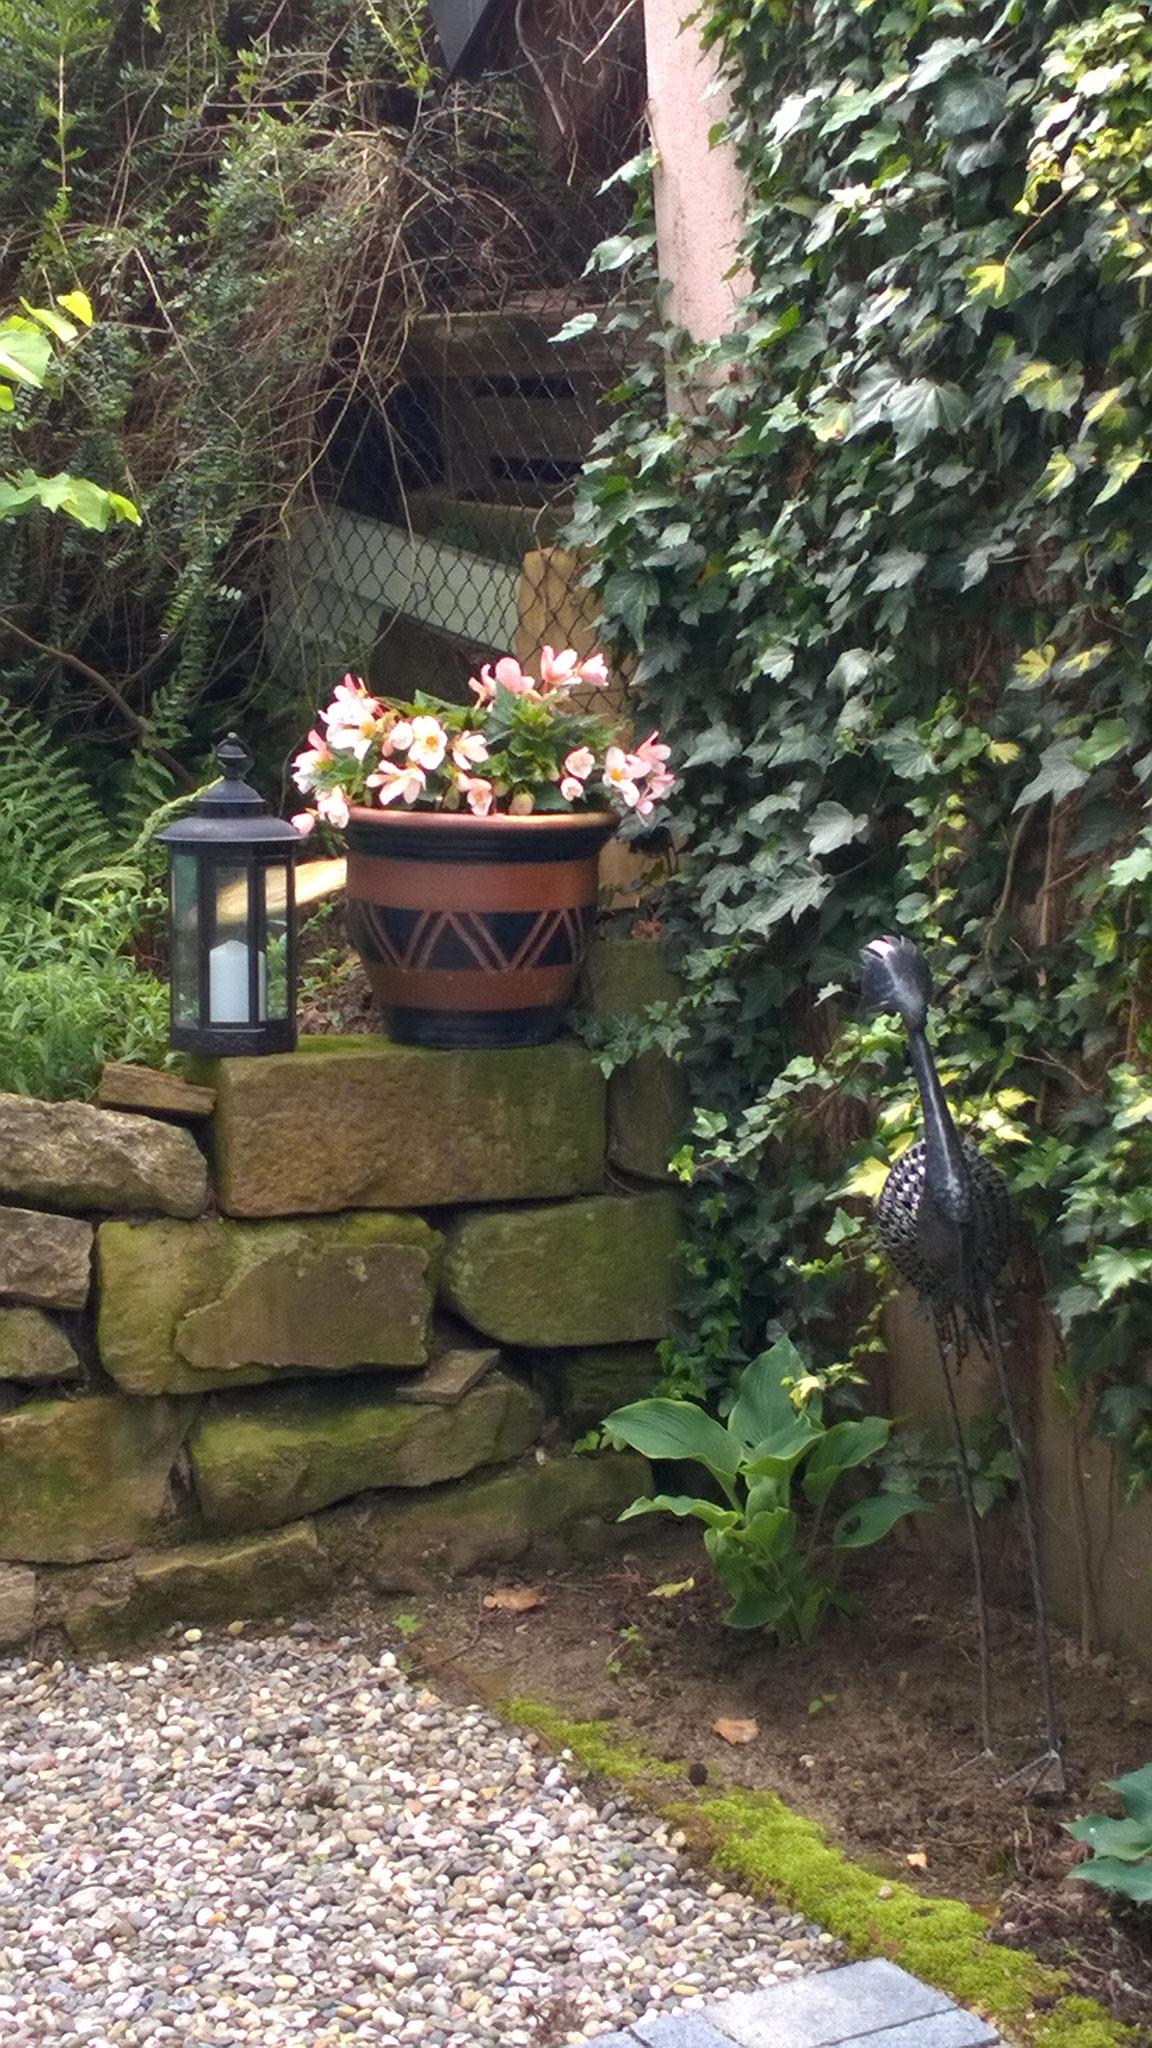 Gartenblick/ Garden view